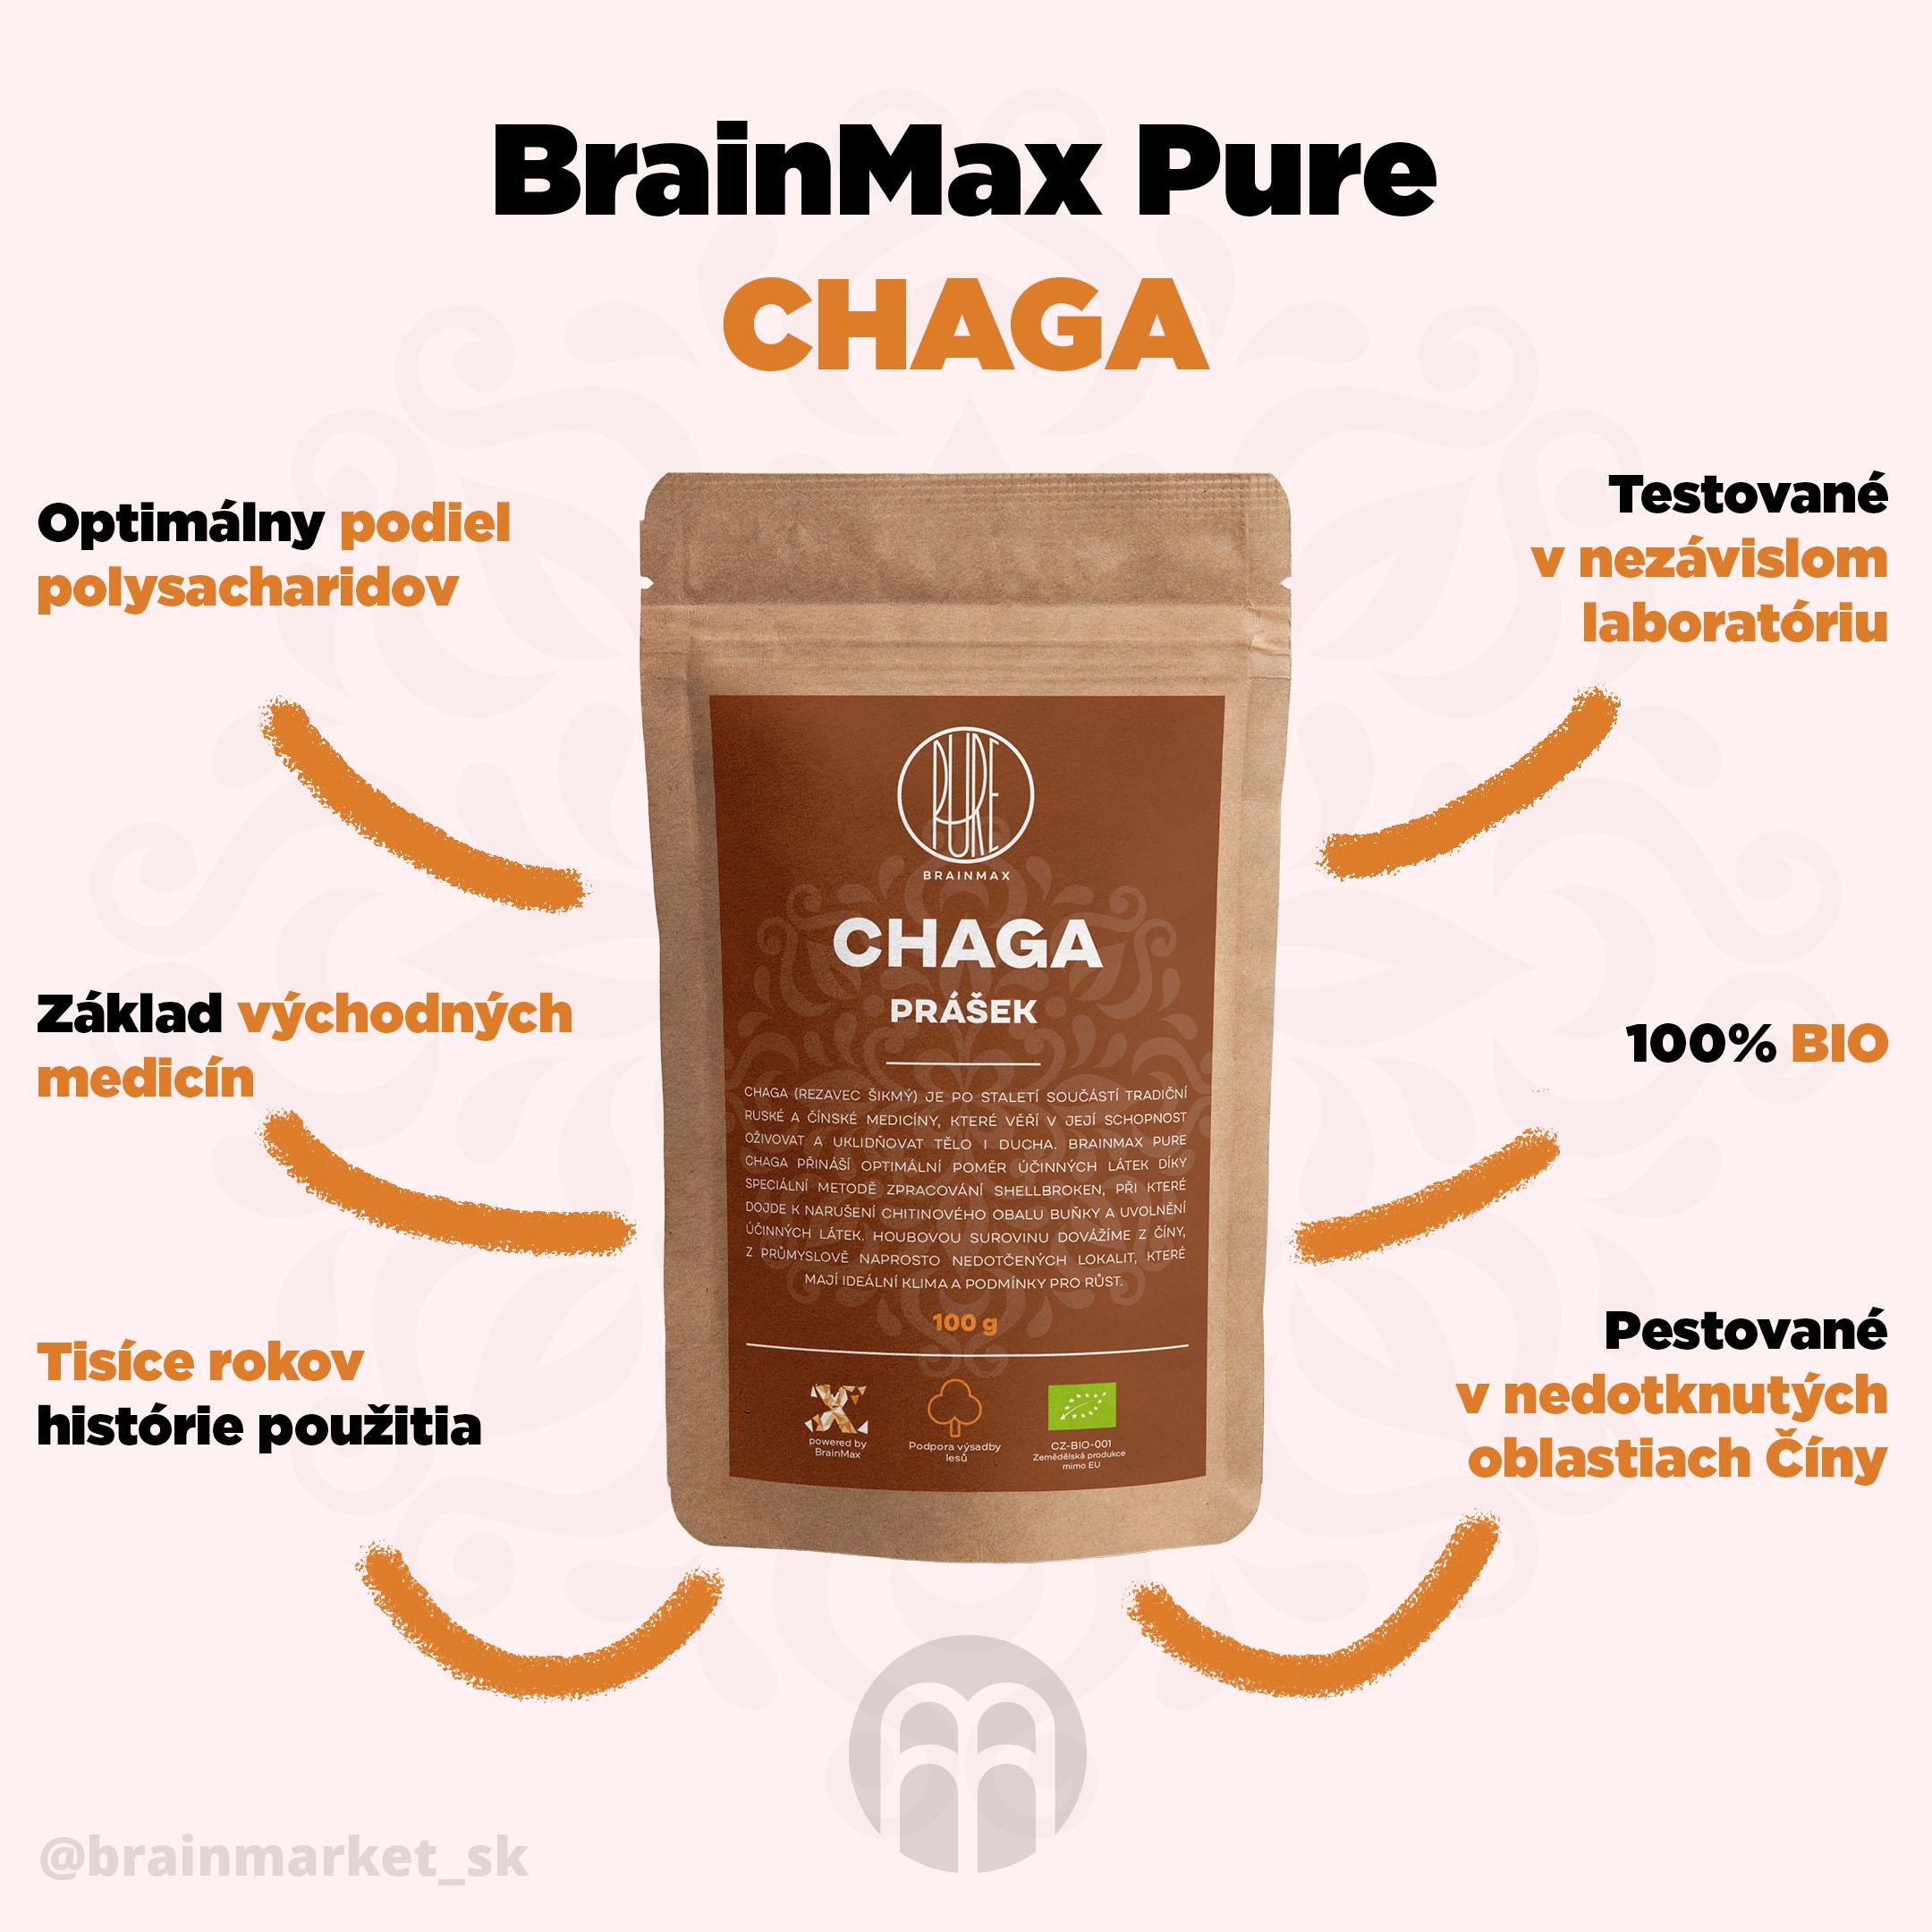 CHAGA_prasek_infografika_brainmarket_sk